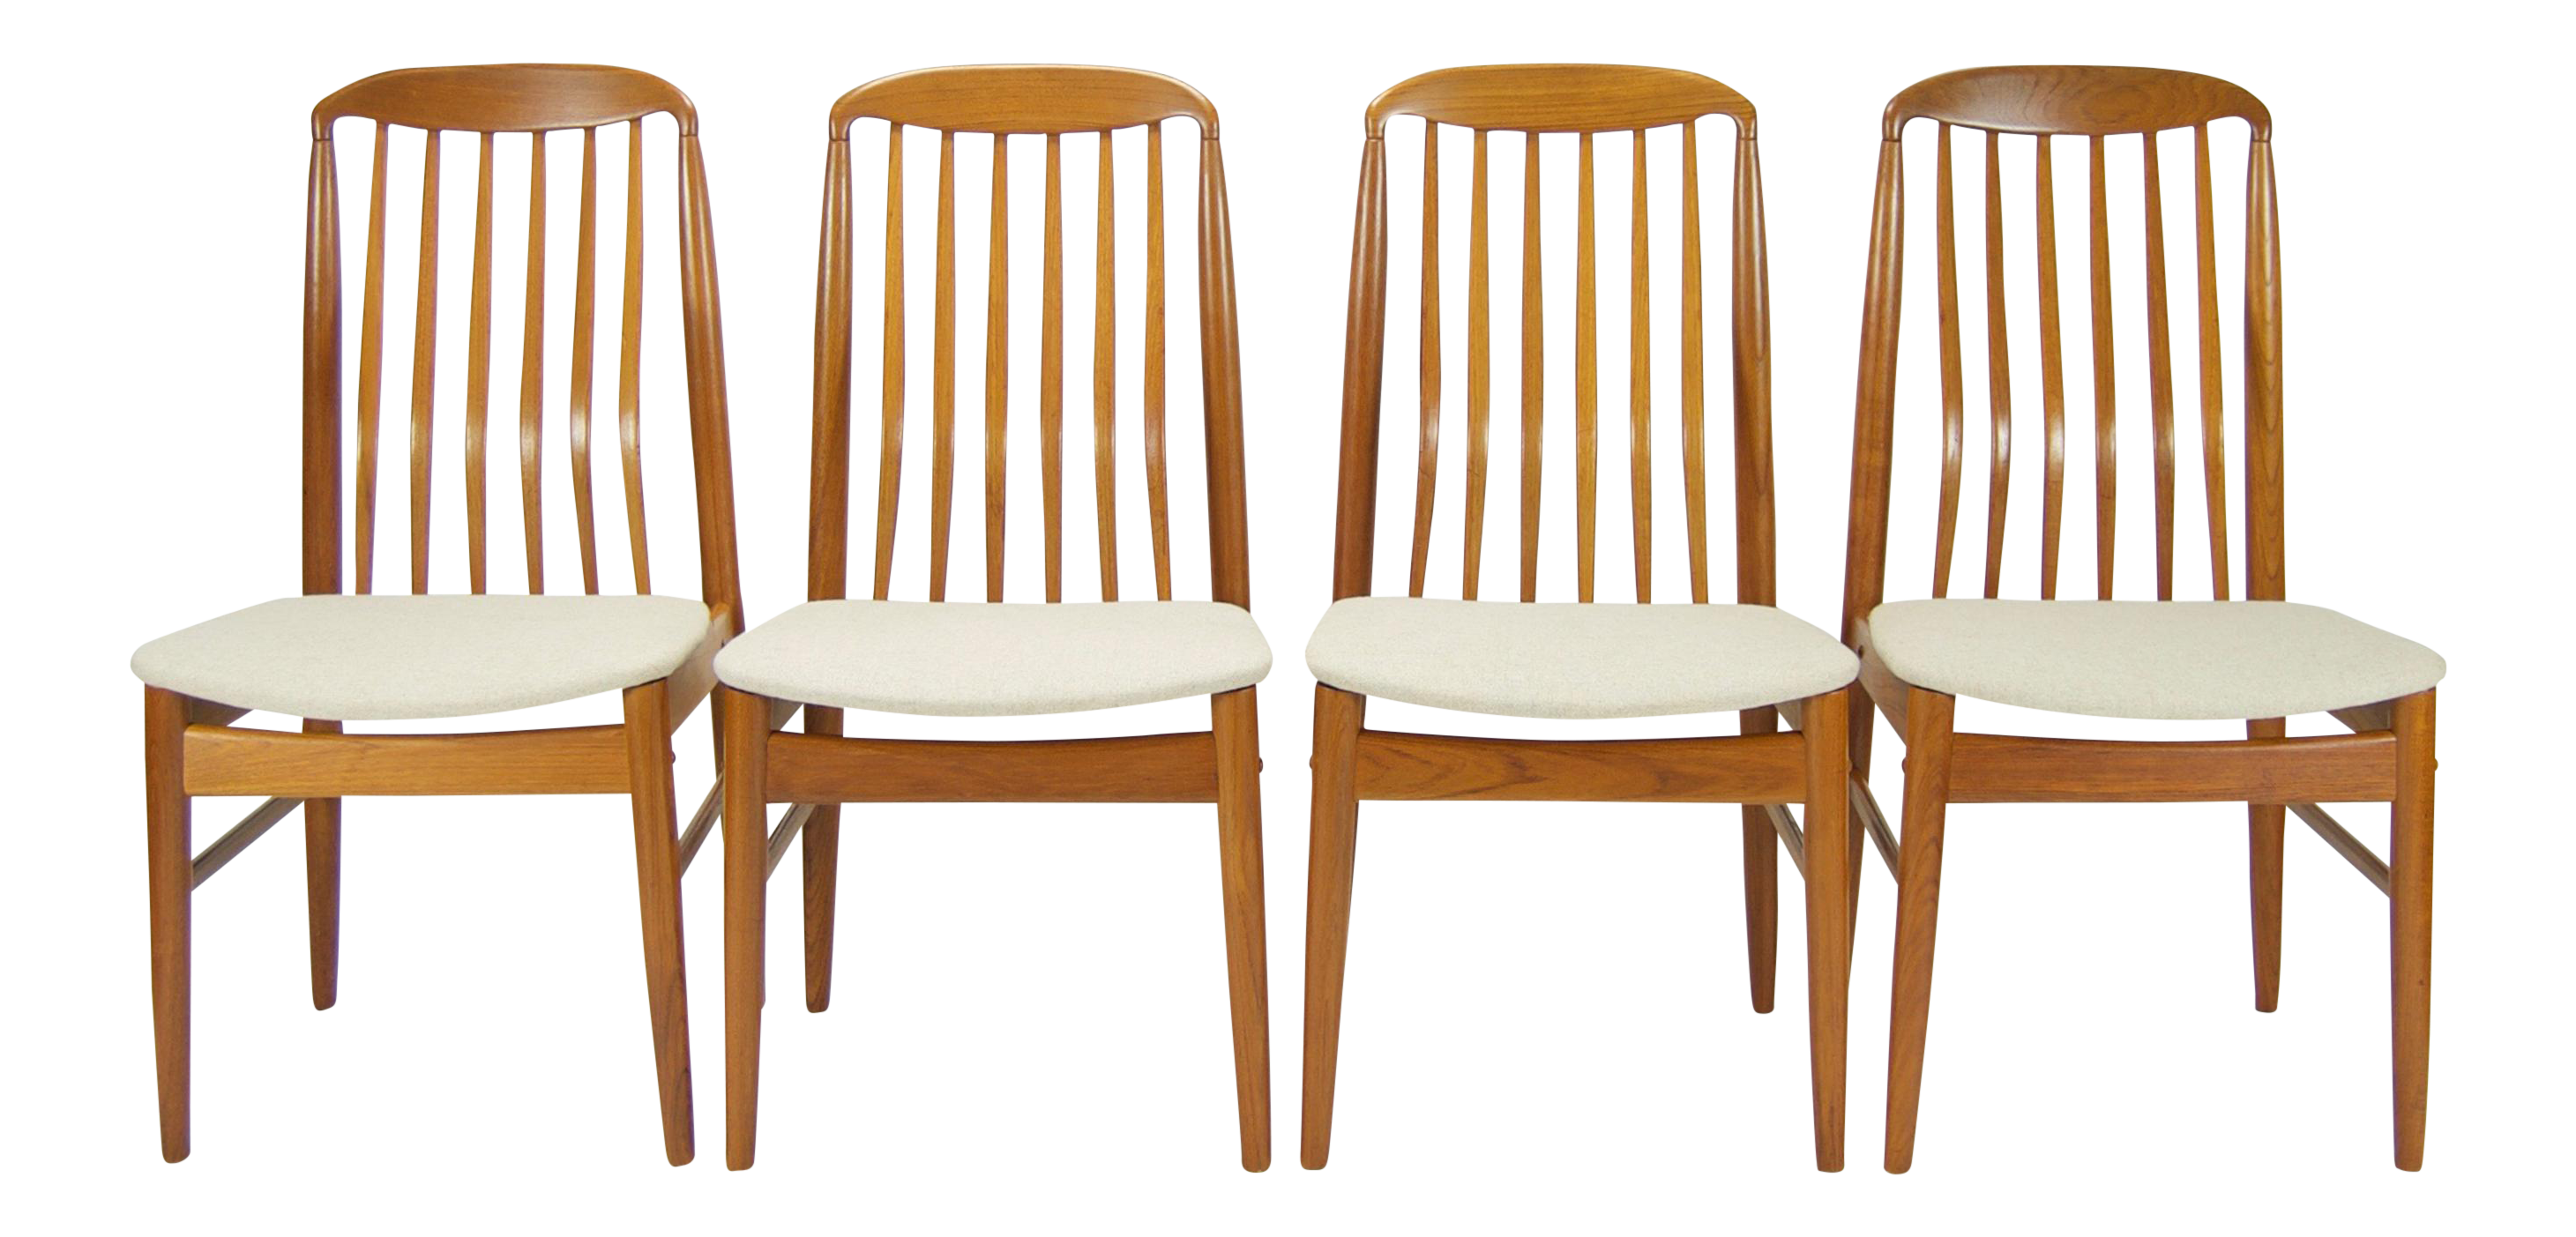 Ansager mobler danish modern dining chairs set of 4 for Modern dining chairs ireland